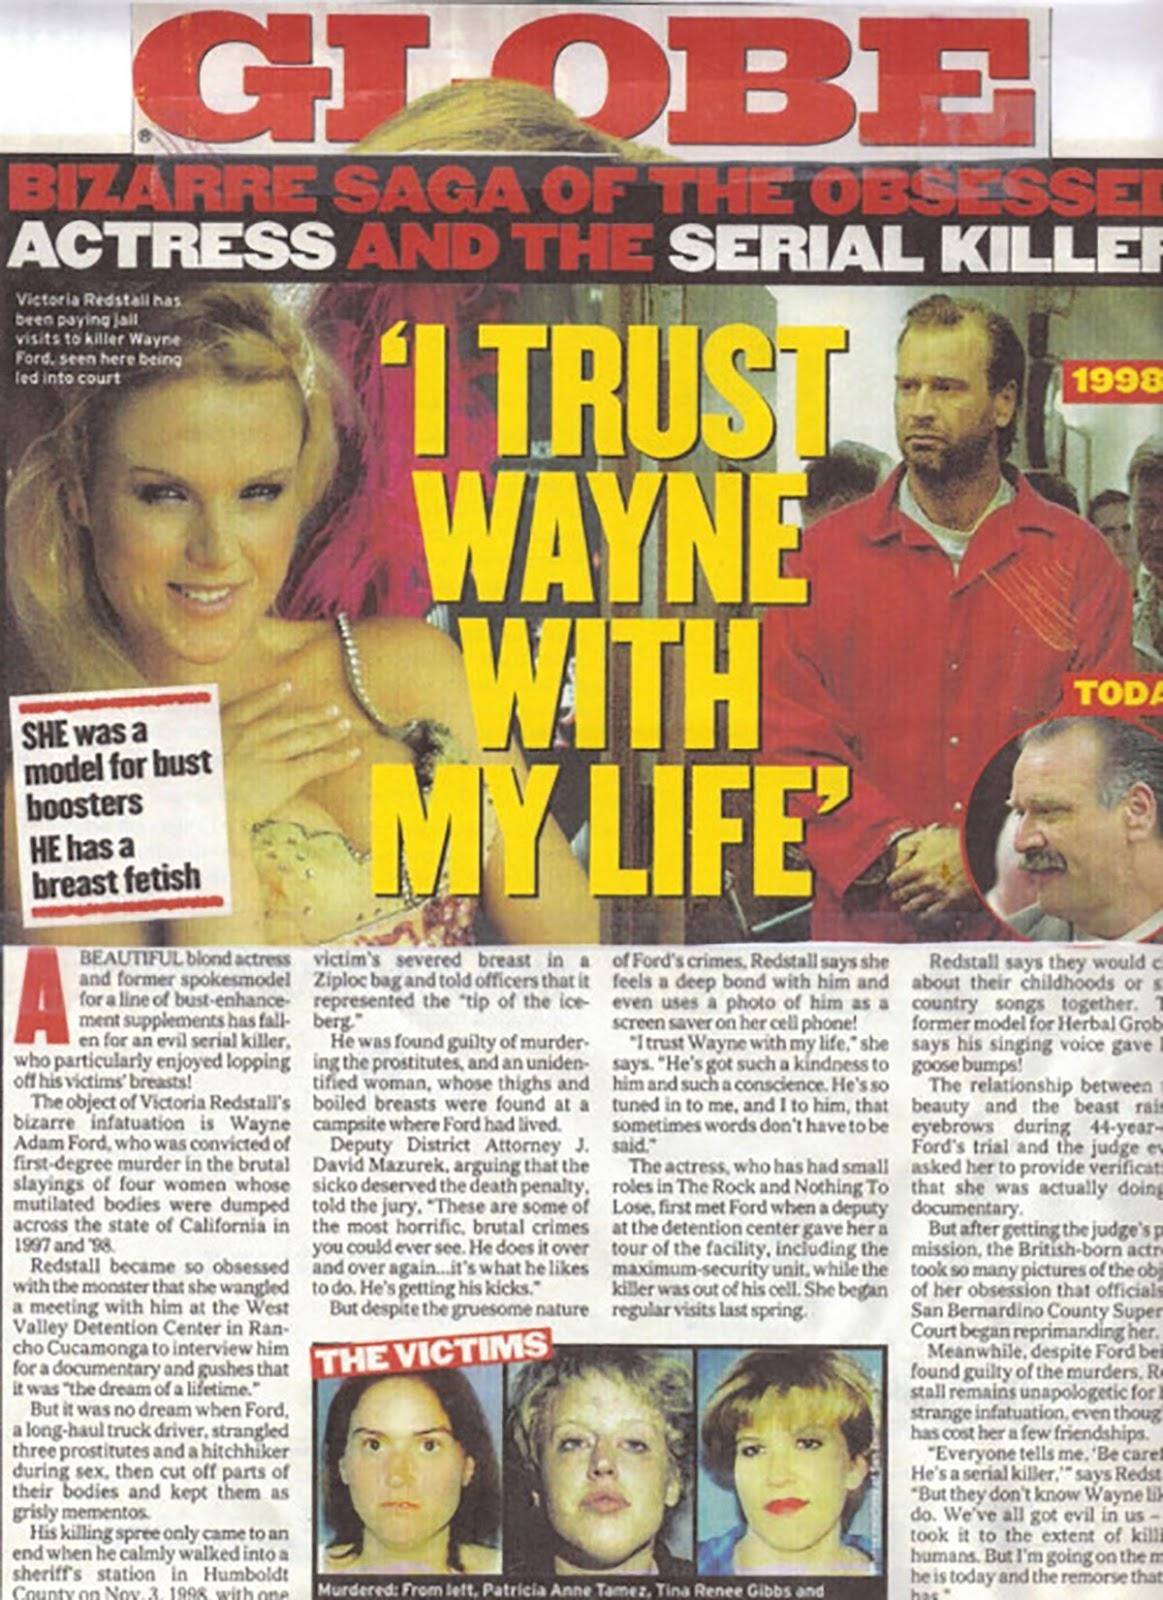 Seriall killer groupies, tietes de seriall killers, assassinos em série